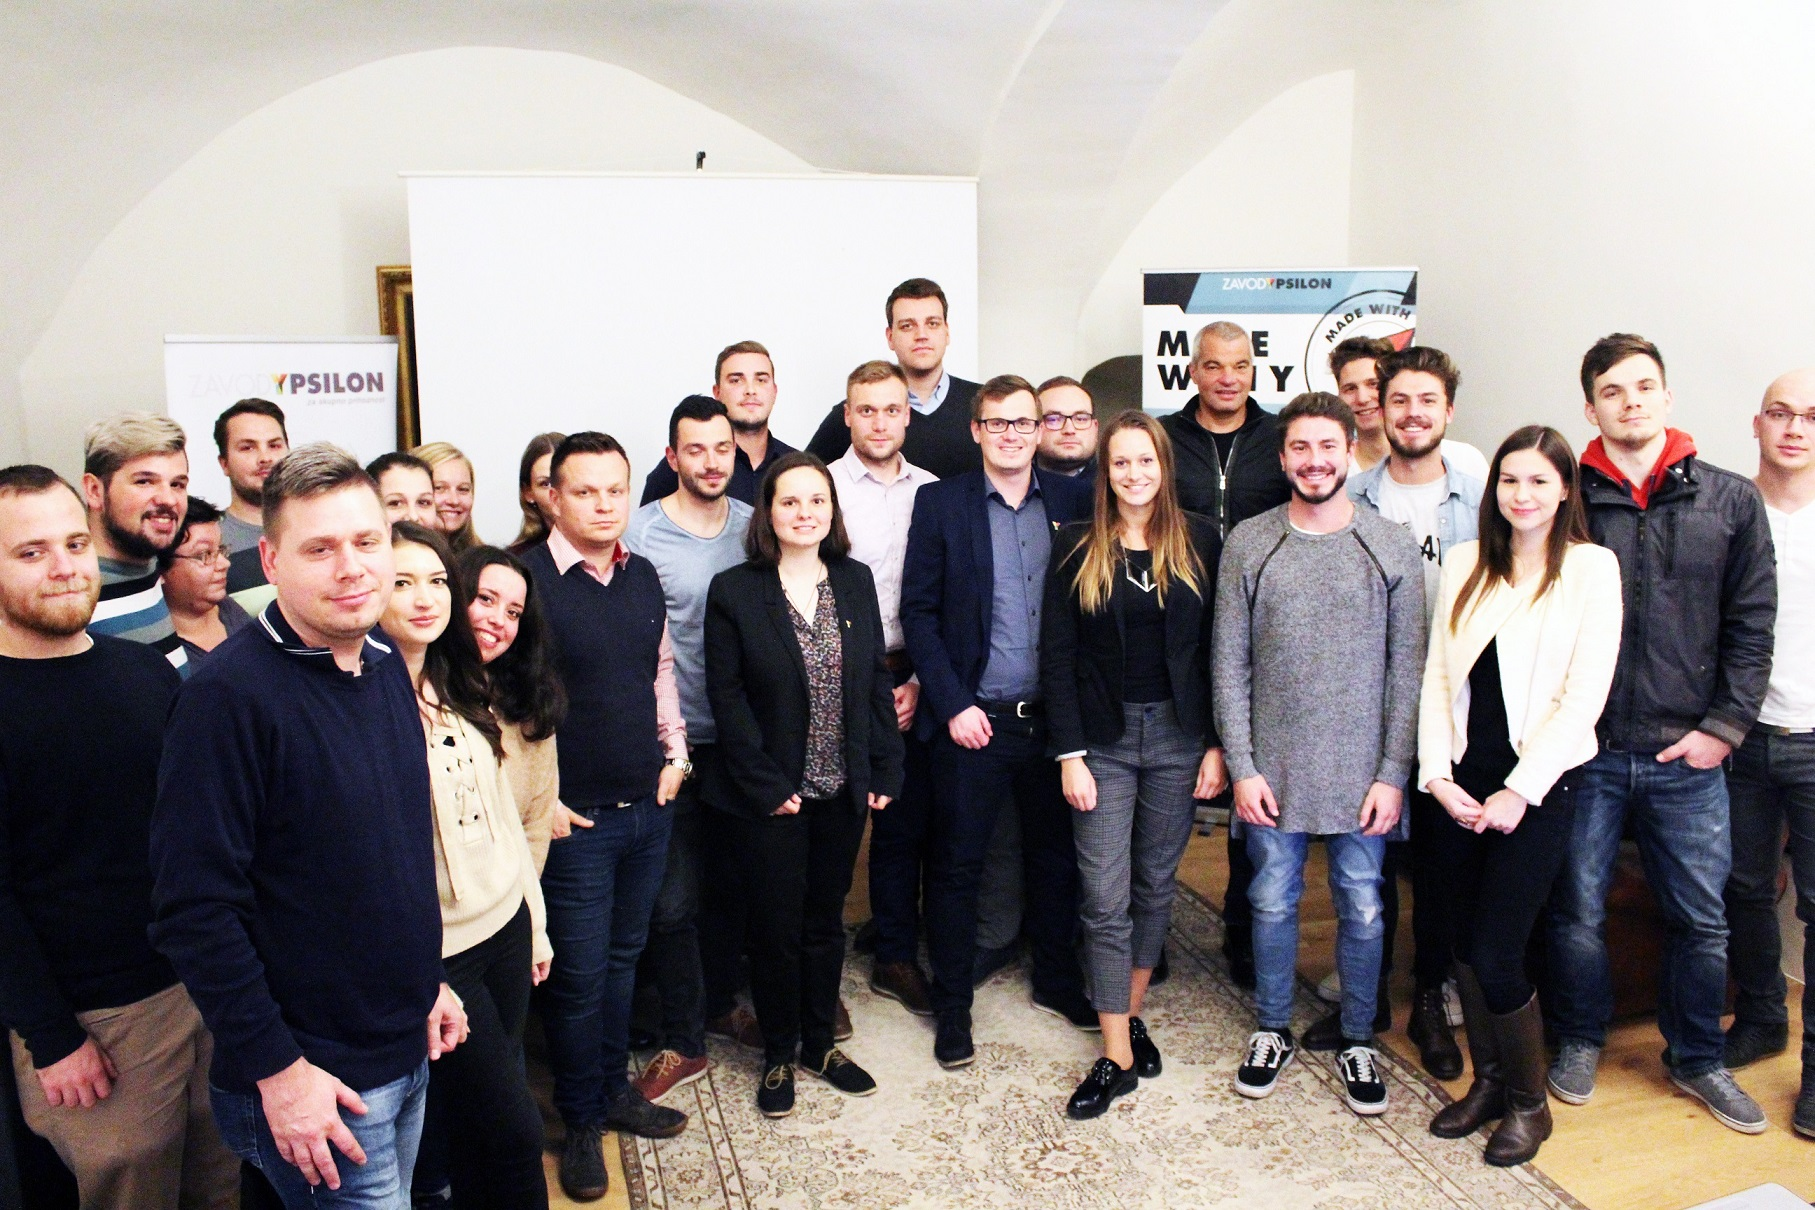 Otvoritvena konferenca 2 cikla projketa Made with Y Maribor 3